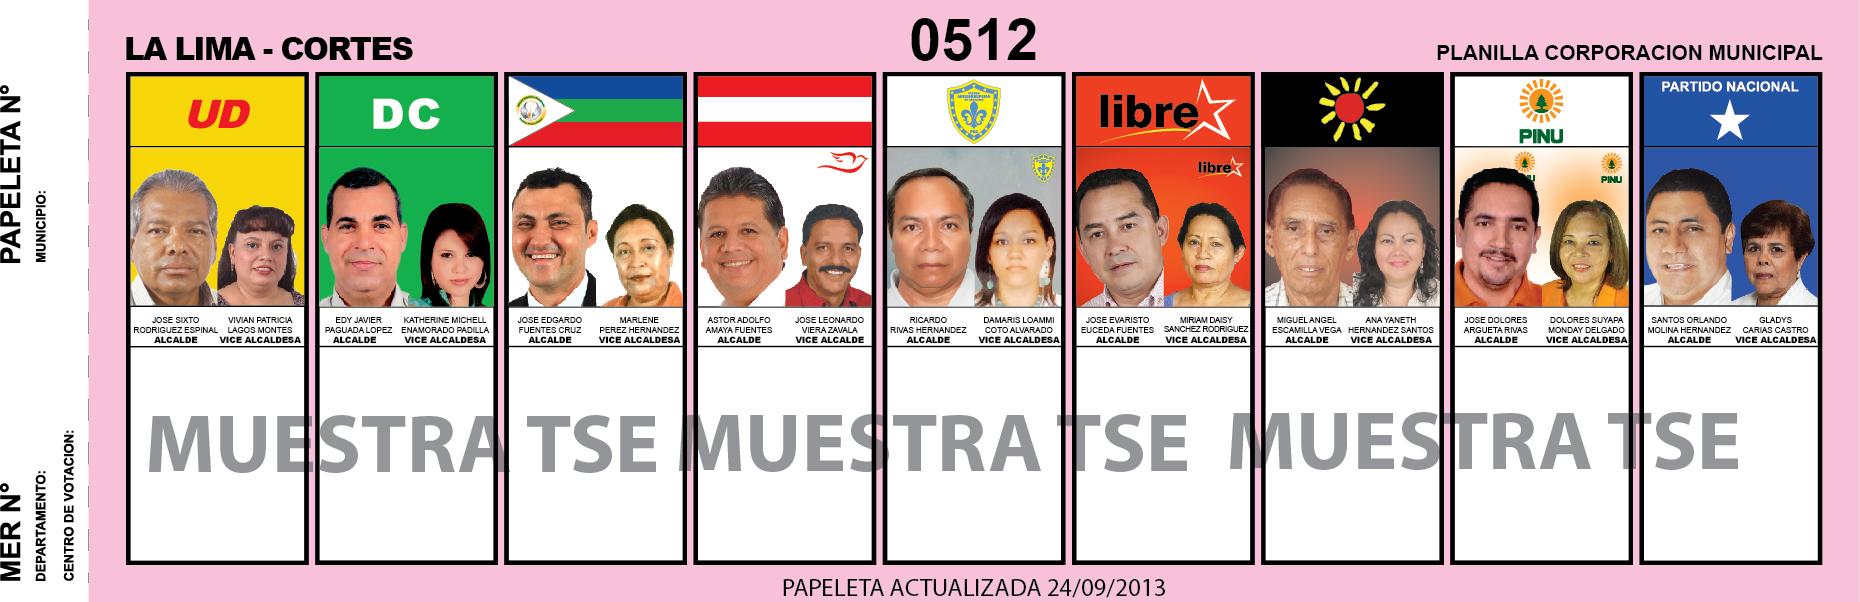 CANDIDATOS 2013 MUNICIPIO LA LIMA - CORTES - HONDURAS